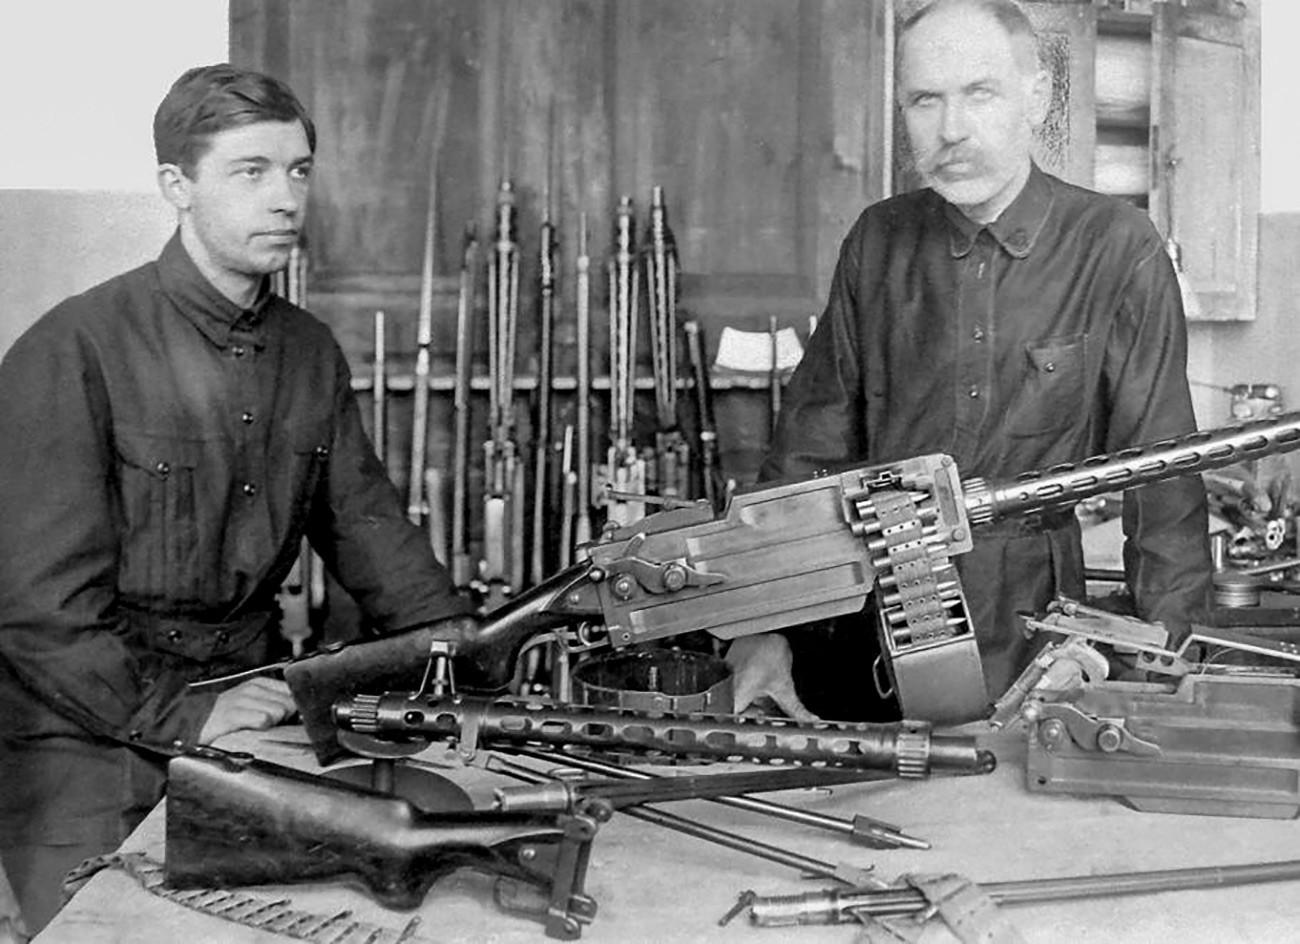 Fedor Tokarev with his son.